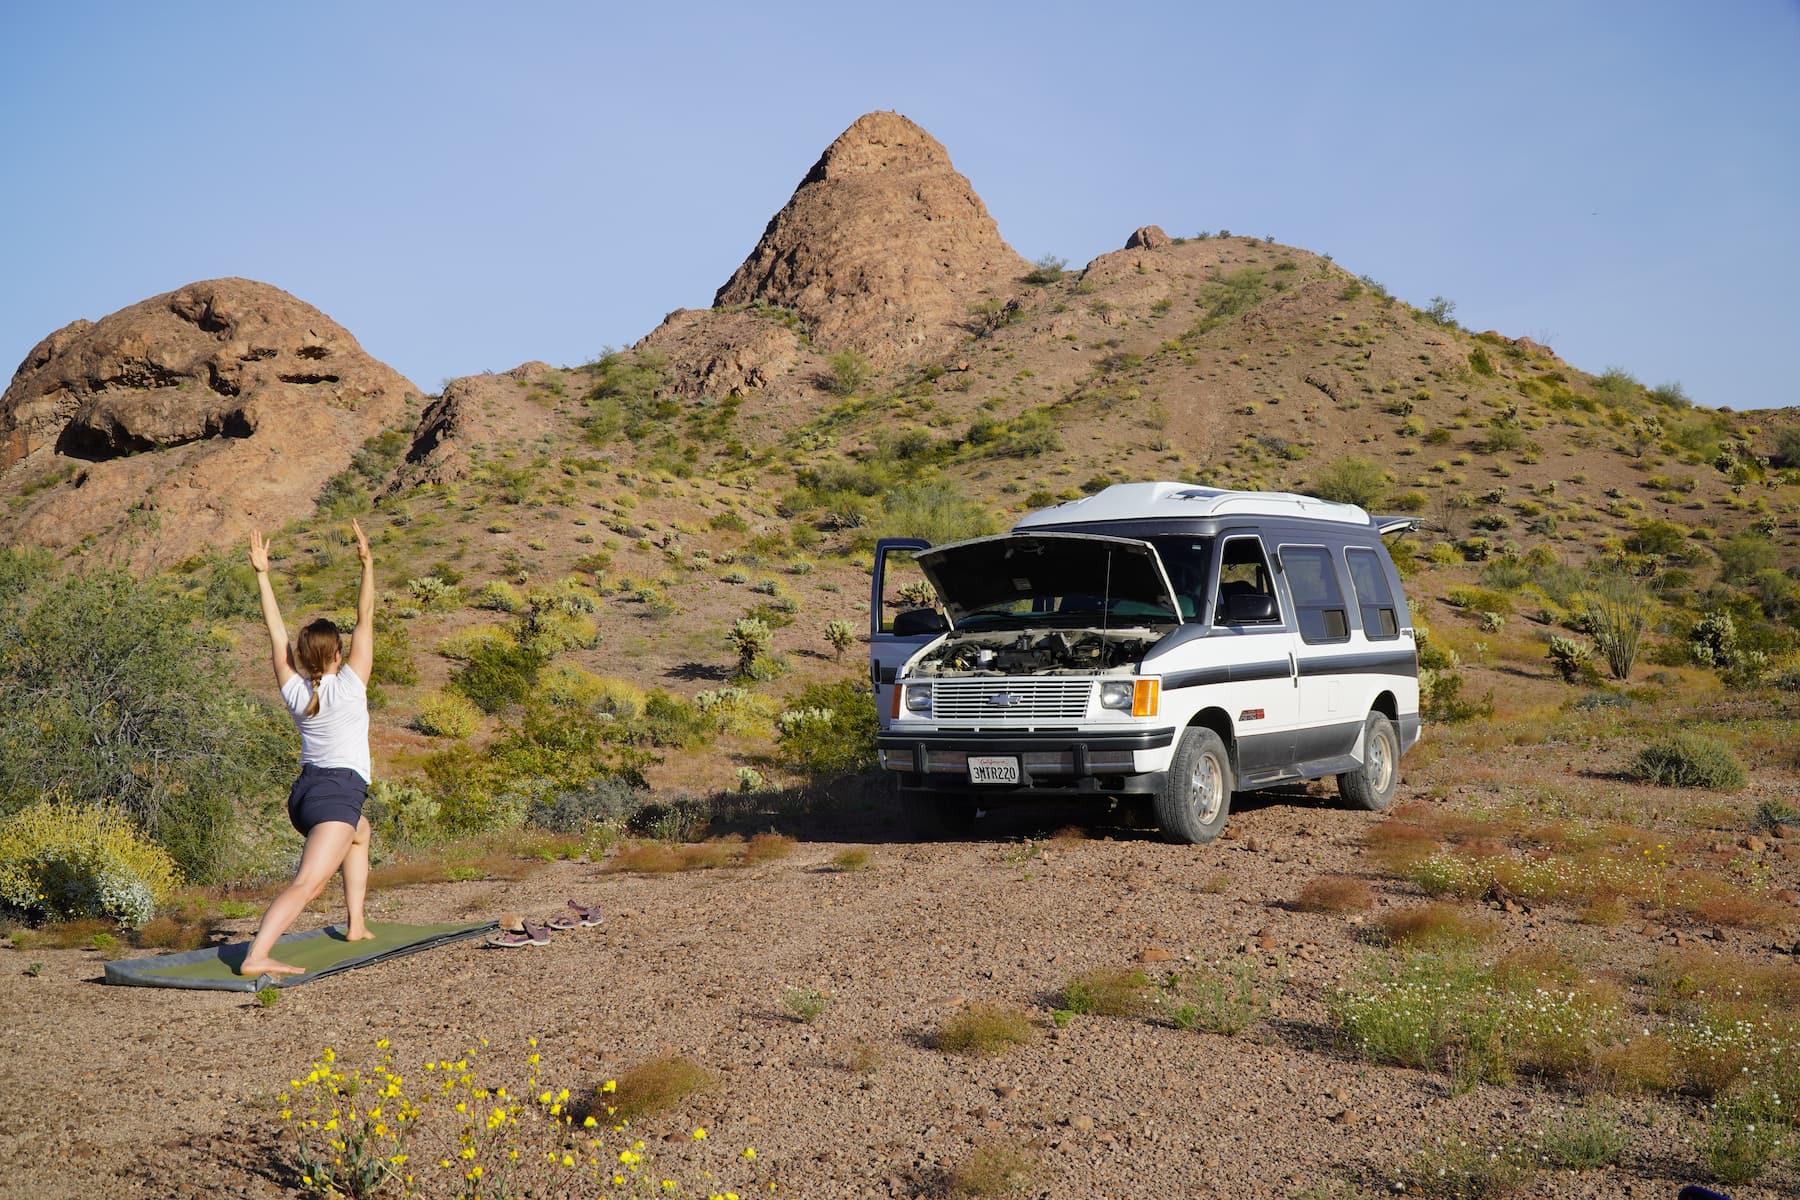 Kristin Hanes founder of The Wayward Home doing yoga in front of her van in the desert.